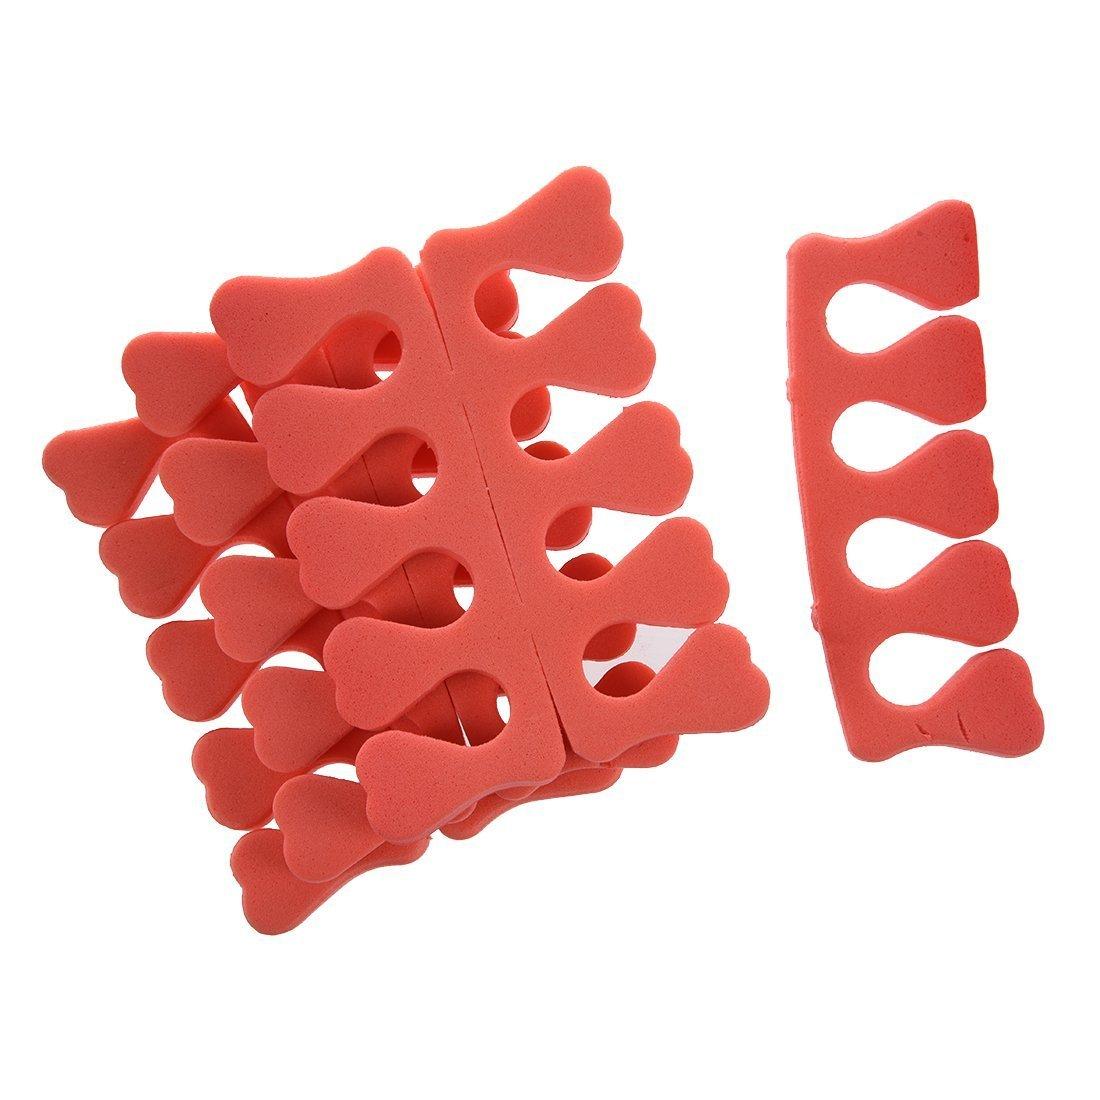 SODIAL (R) 7 Stueck Bunte Nagel Kunst Finger-Zehe-Weichschaum Separator Manikuere Pedikuere-Tool SODIAL(R) HM64